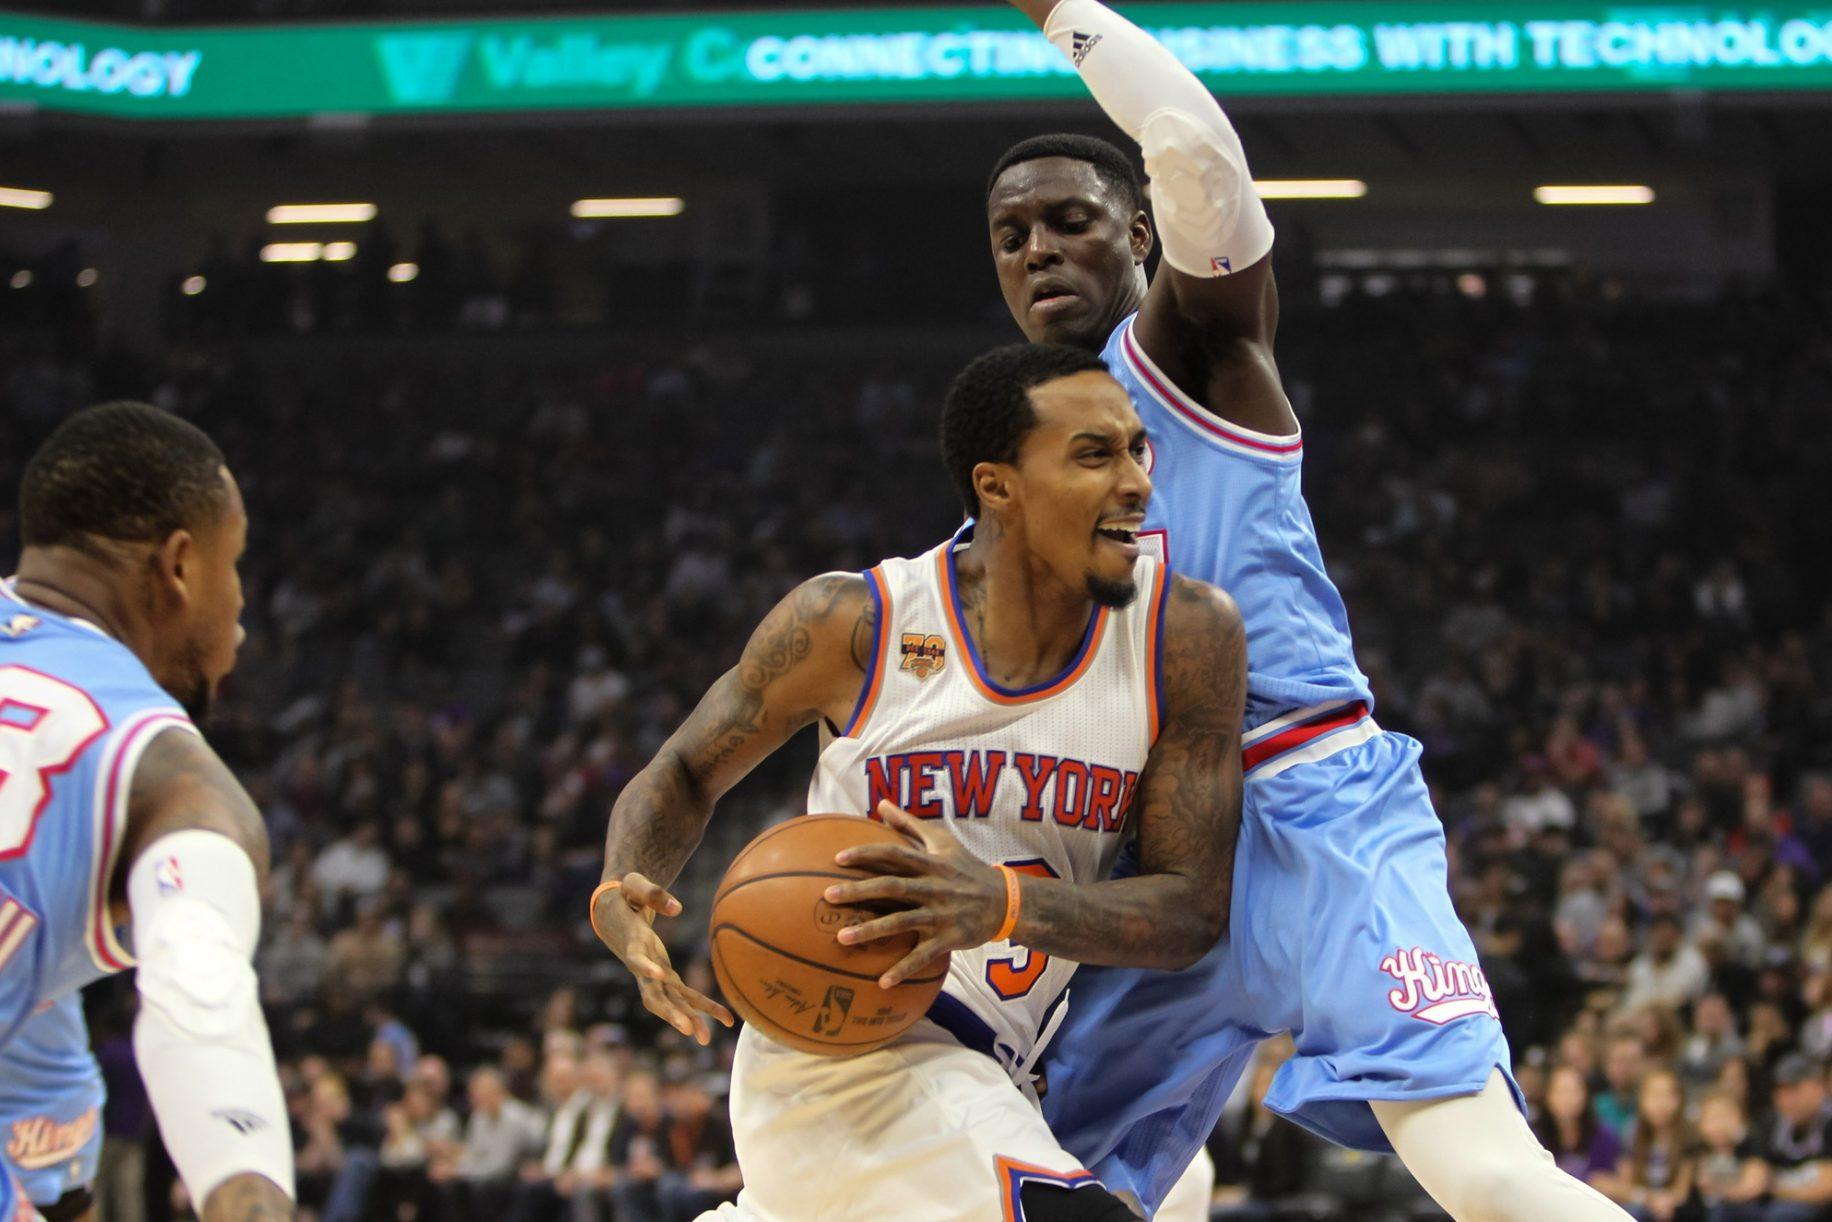 New York Knicks: Brandon Jennings' new attitude has fueled his on-court maturation